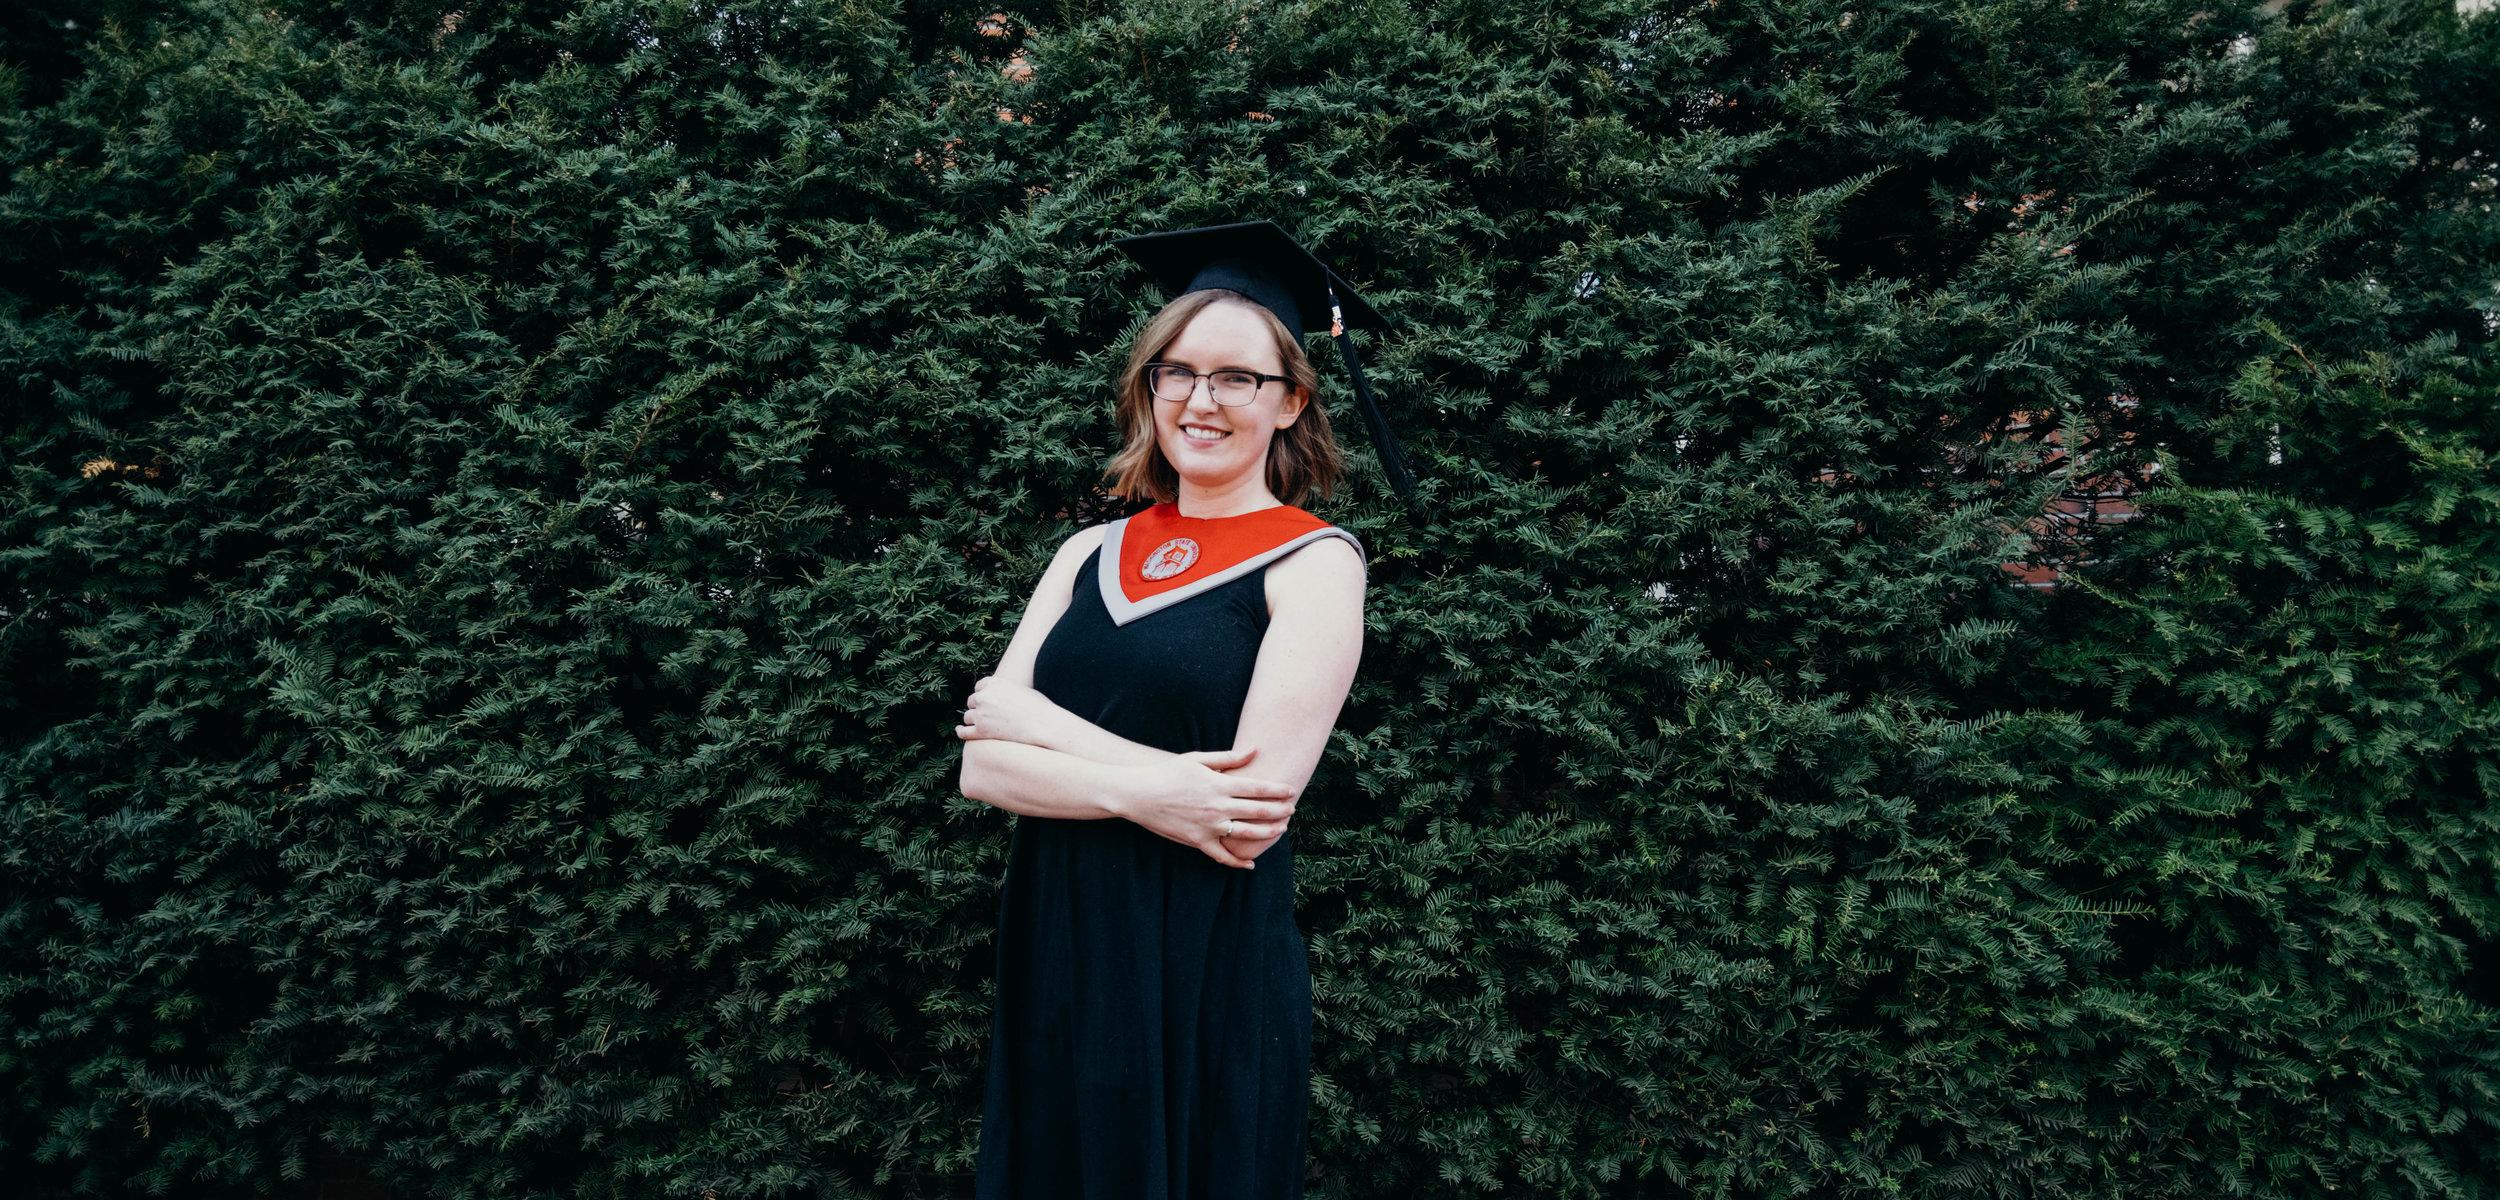 jamie marks | wsu 2017 graduation session | heather woolery